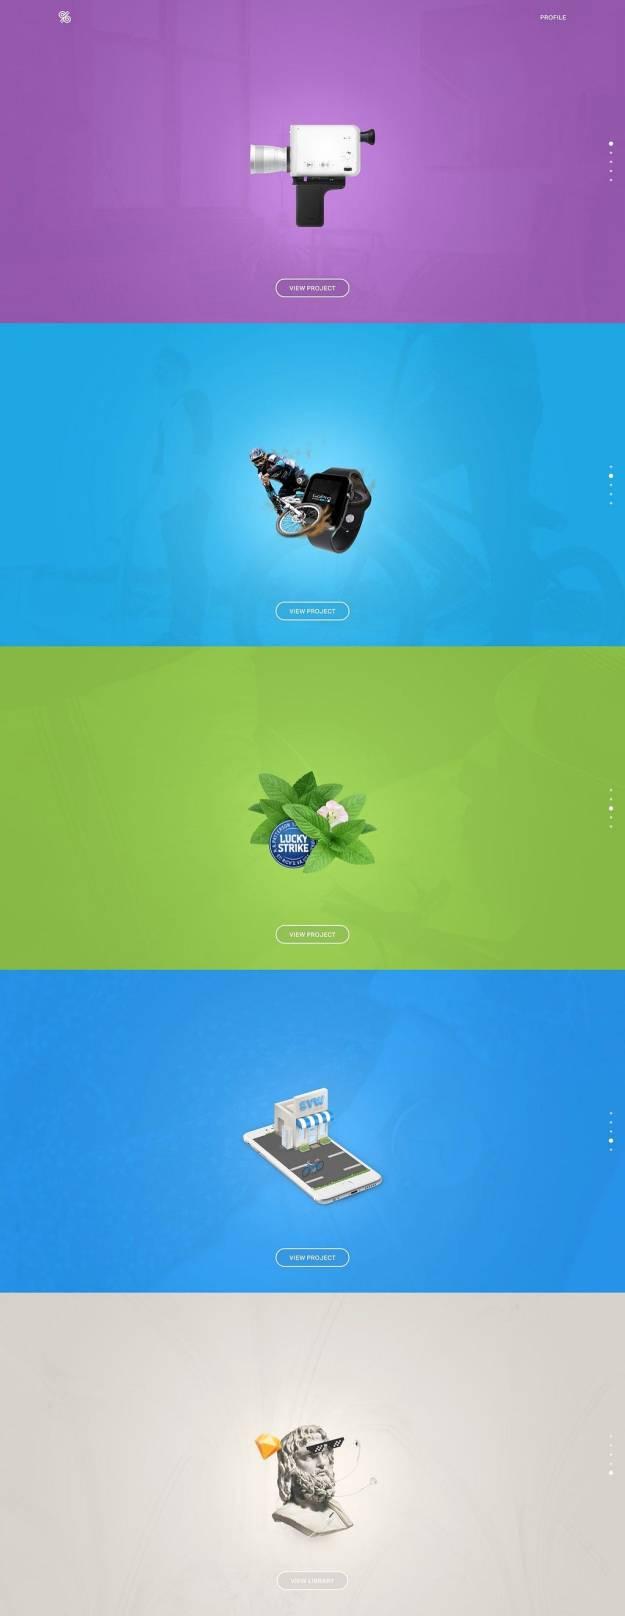 1*1INDAcebqAwVYSlIgxu7AA Editors' Picks Vol. 1 — Best Portfolio Websites on Bestfolios.com Design Random